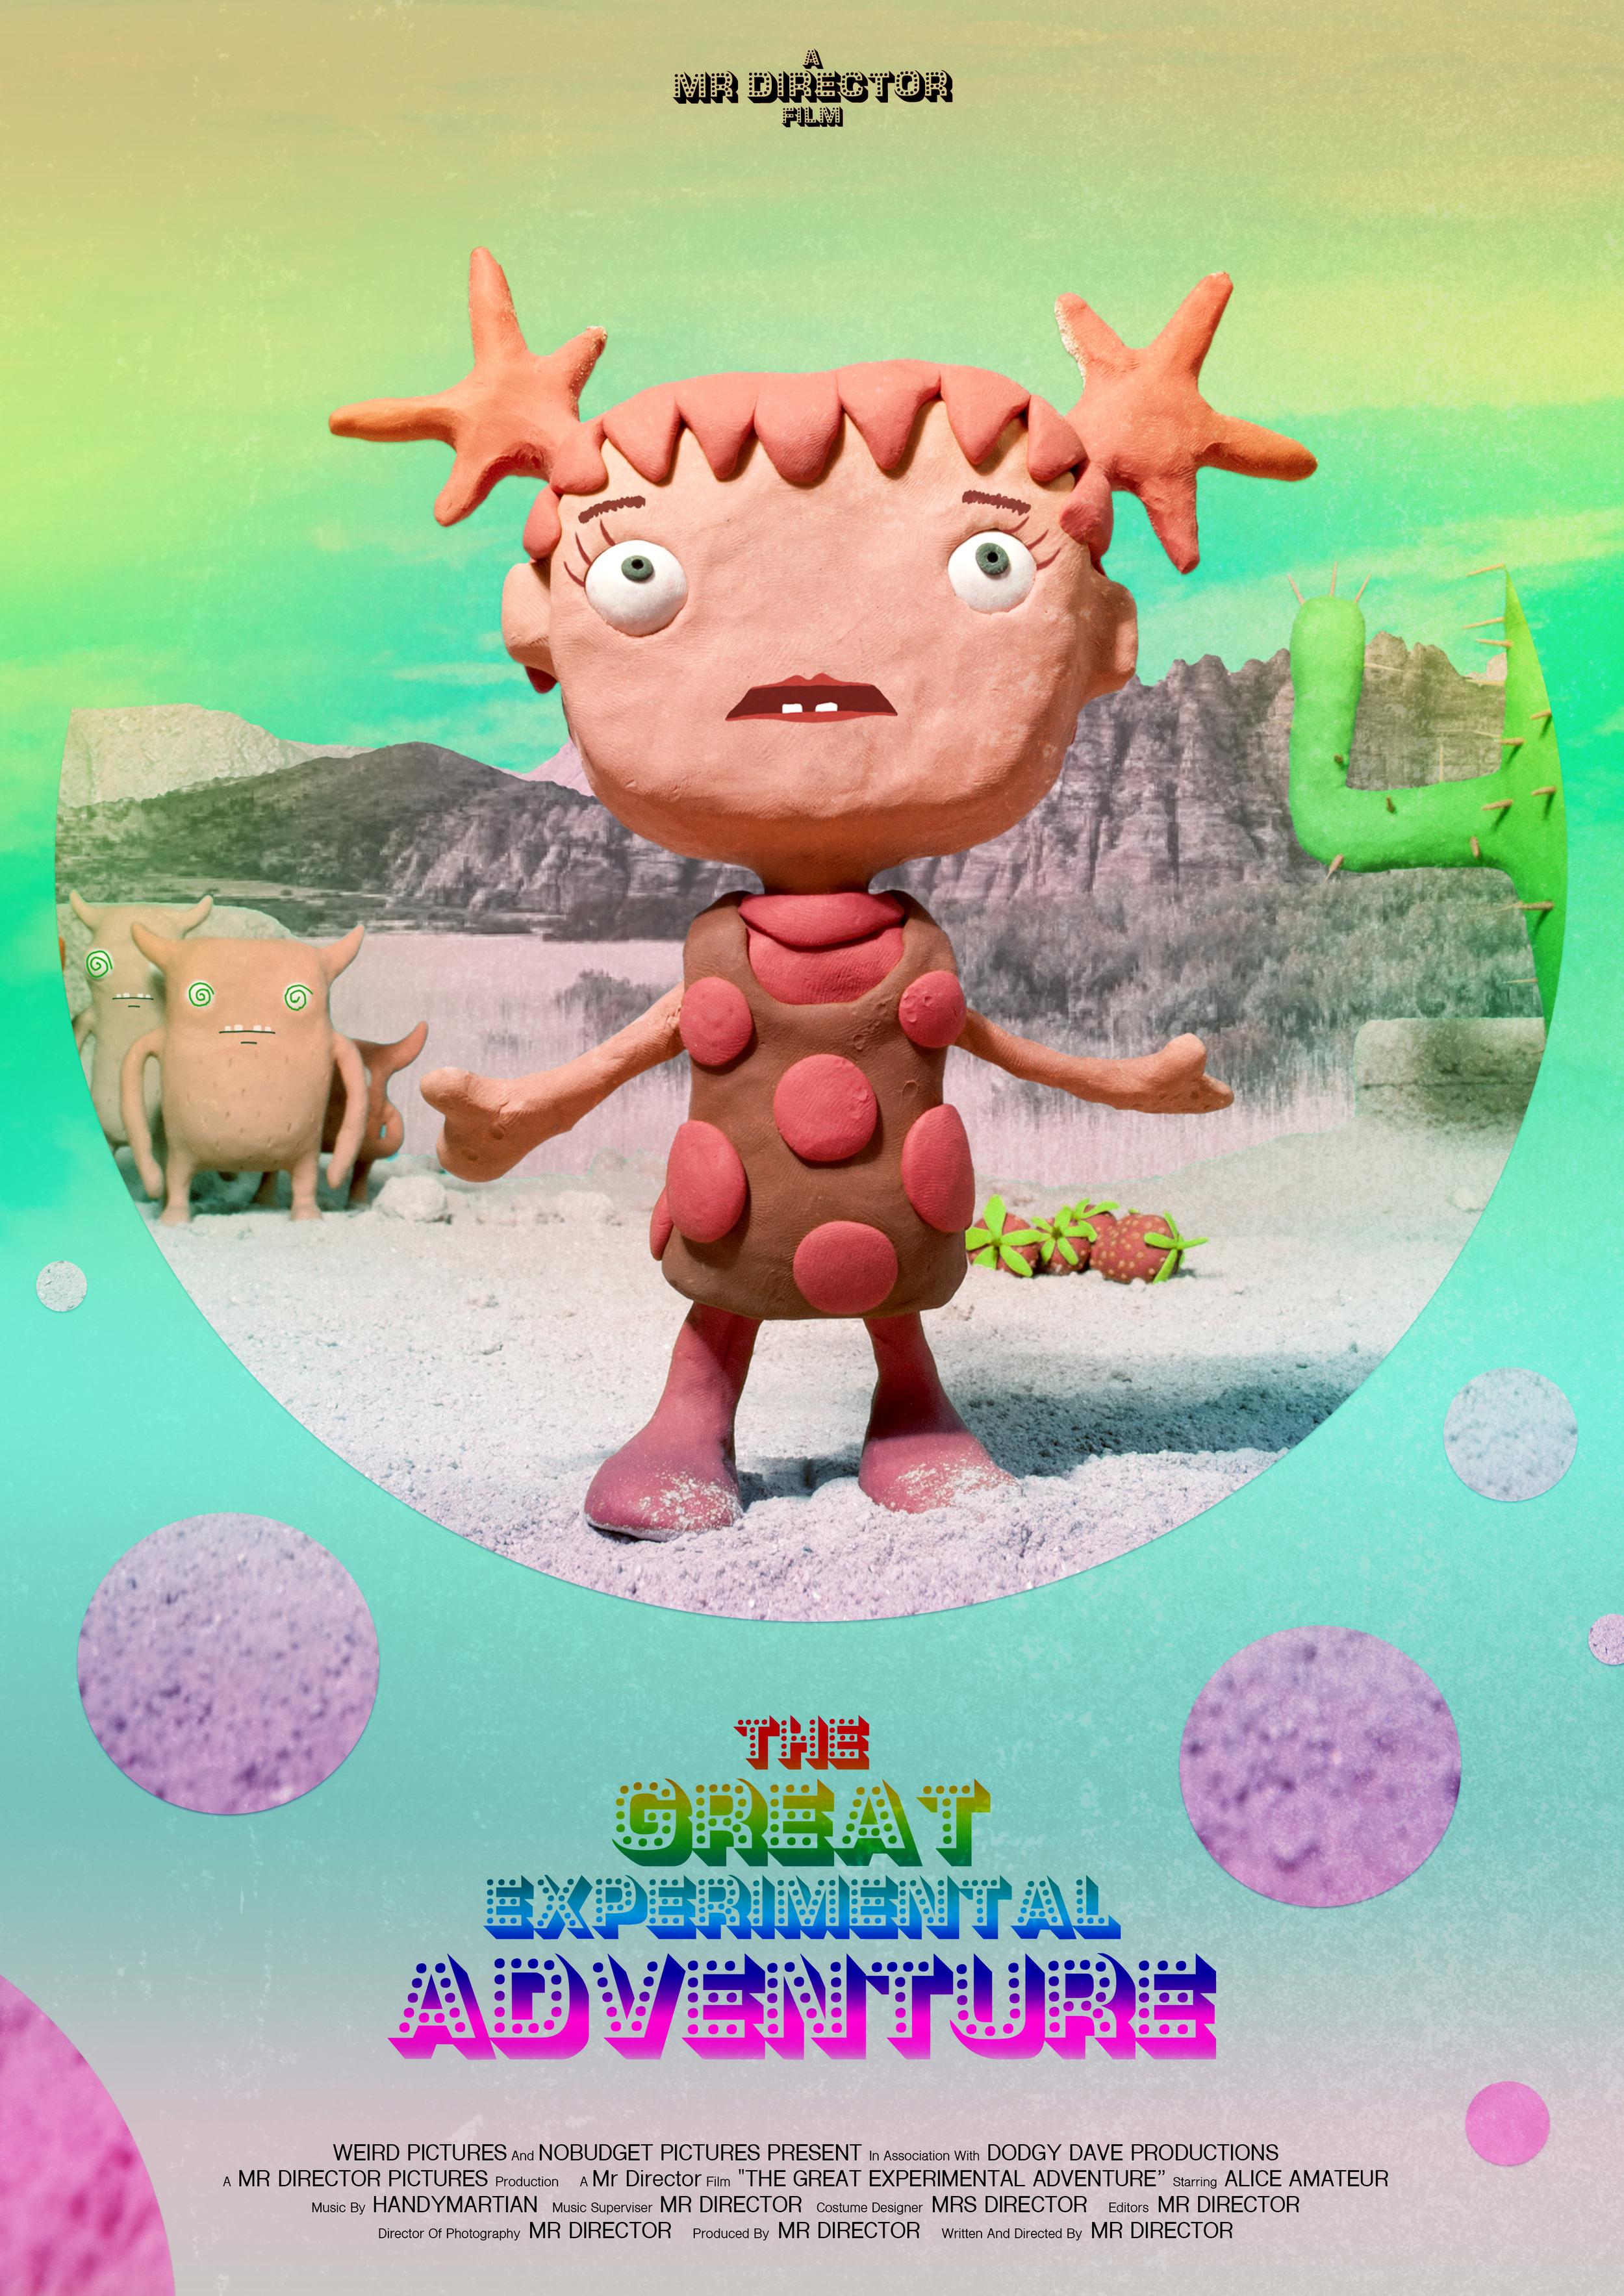 TheGreatExperimentalAdventure-poster01.jpg